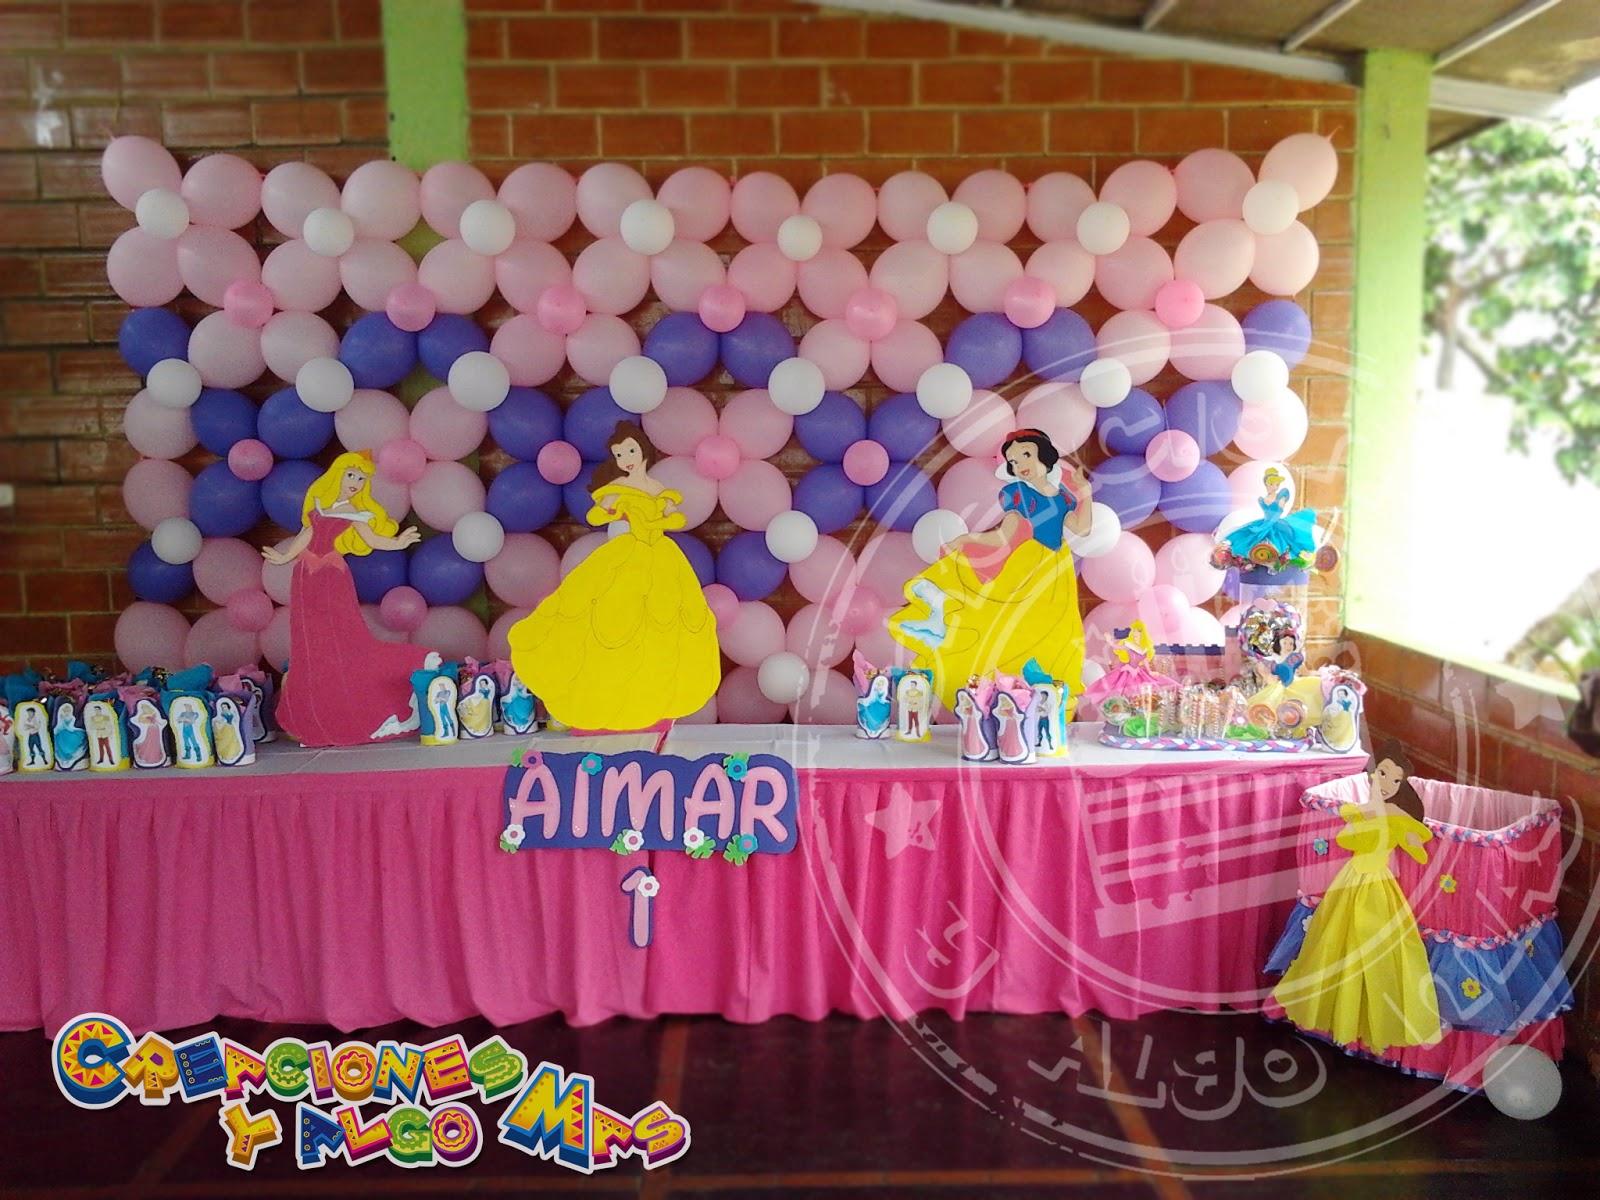 Fiesta motivo princesas disney disney princess party - Fiestas infantiles princesas disney ...